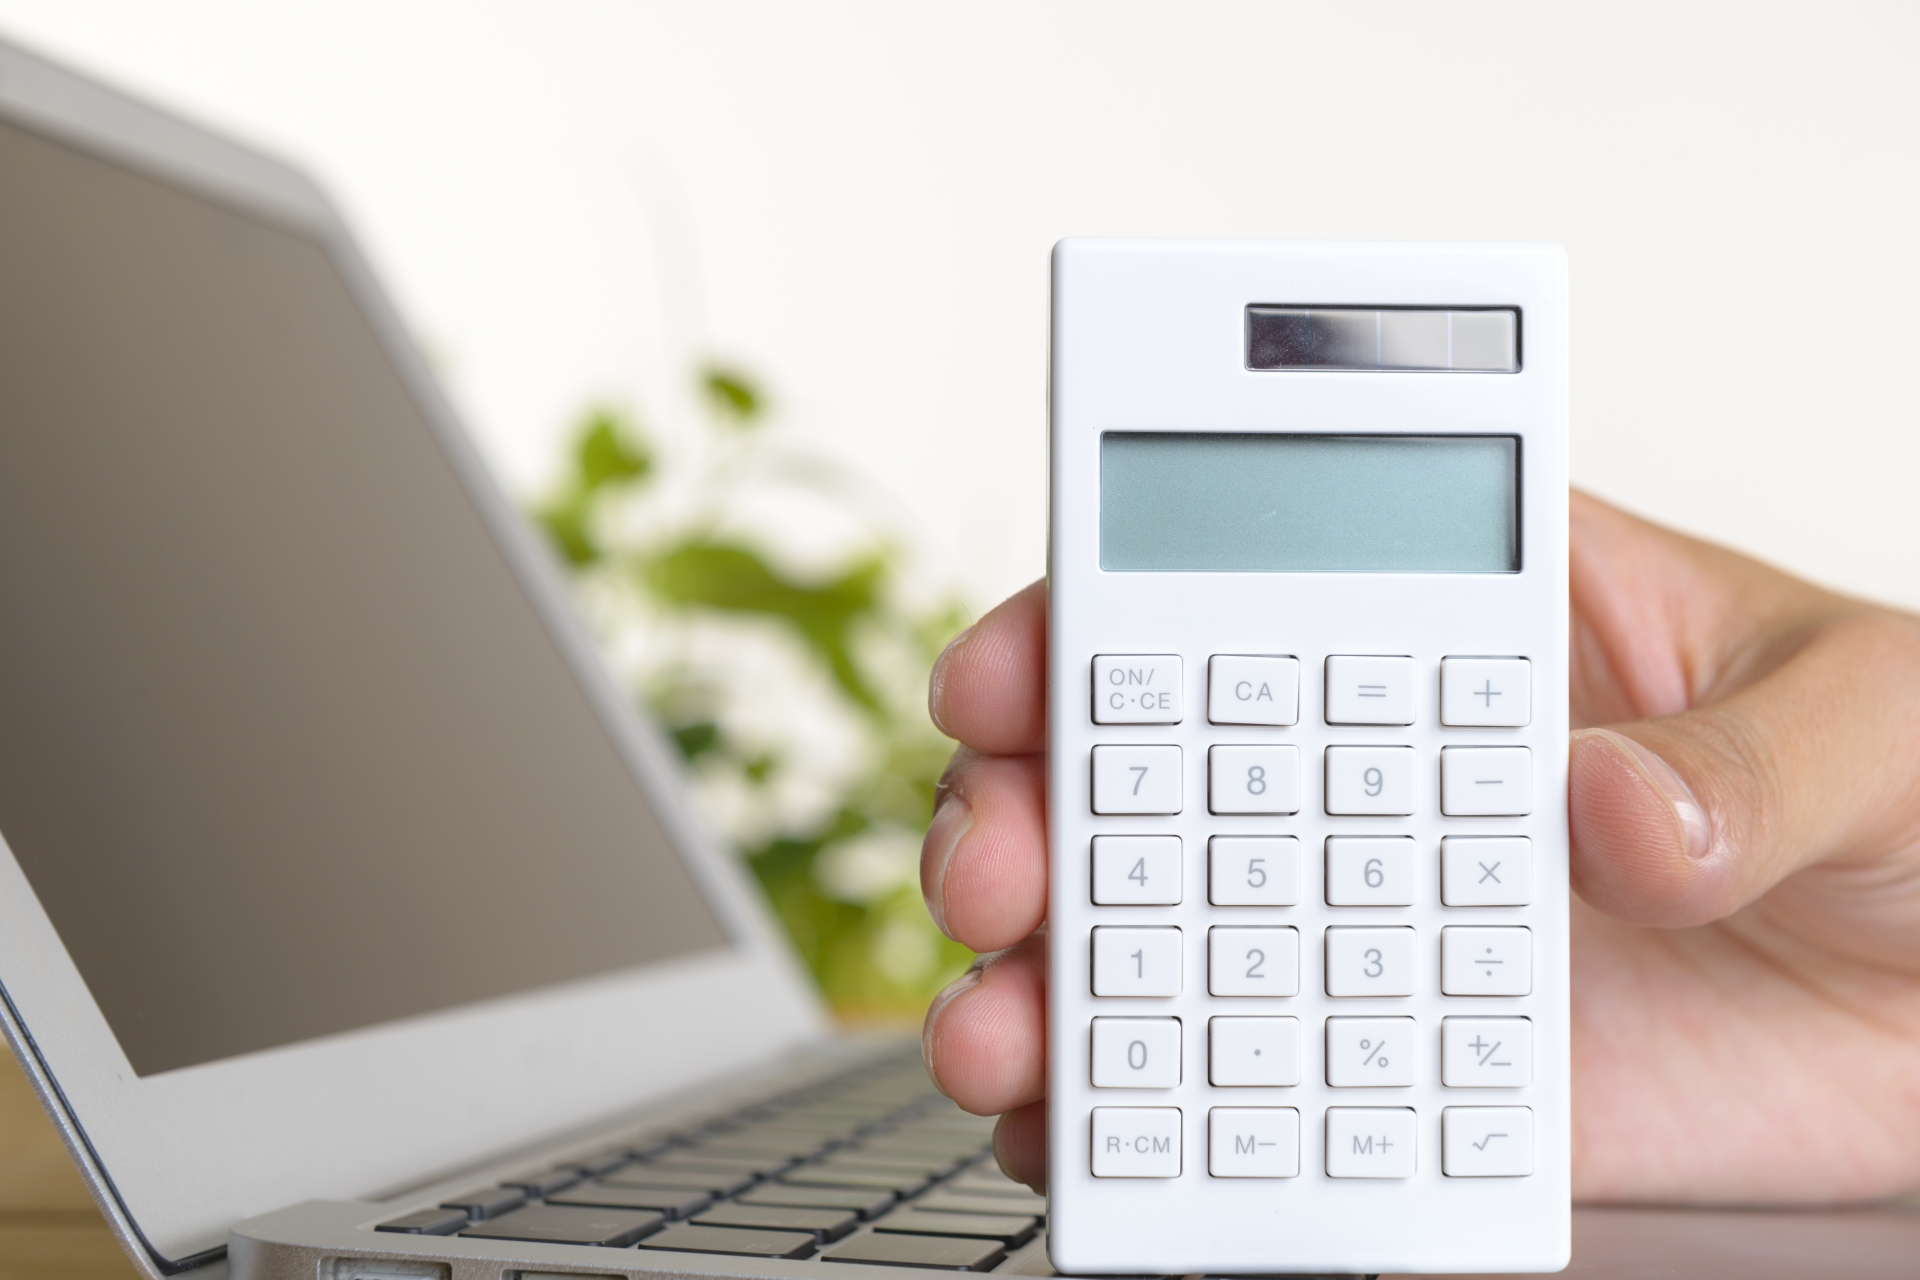 calculator-personal-computer-1